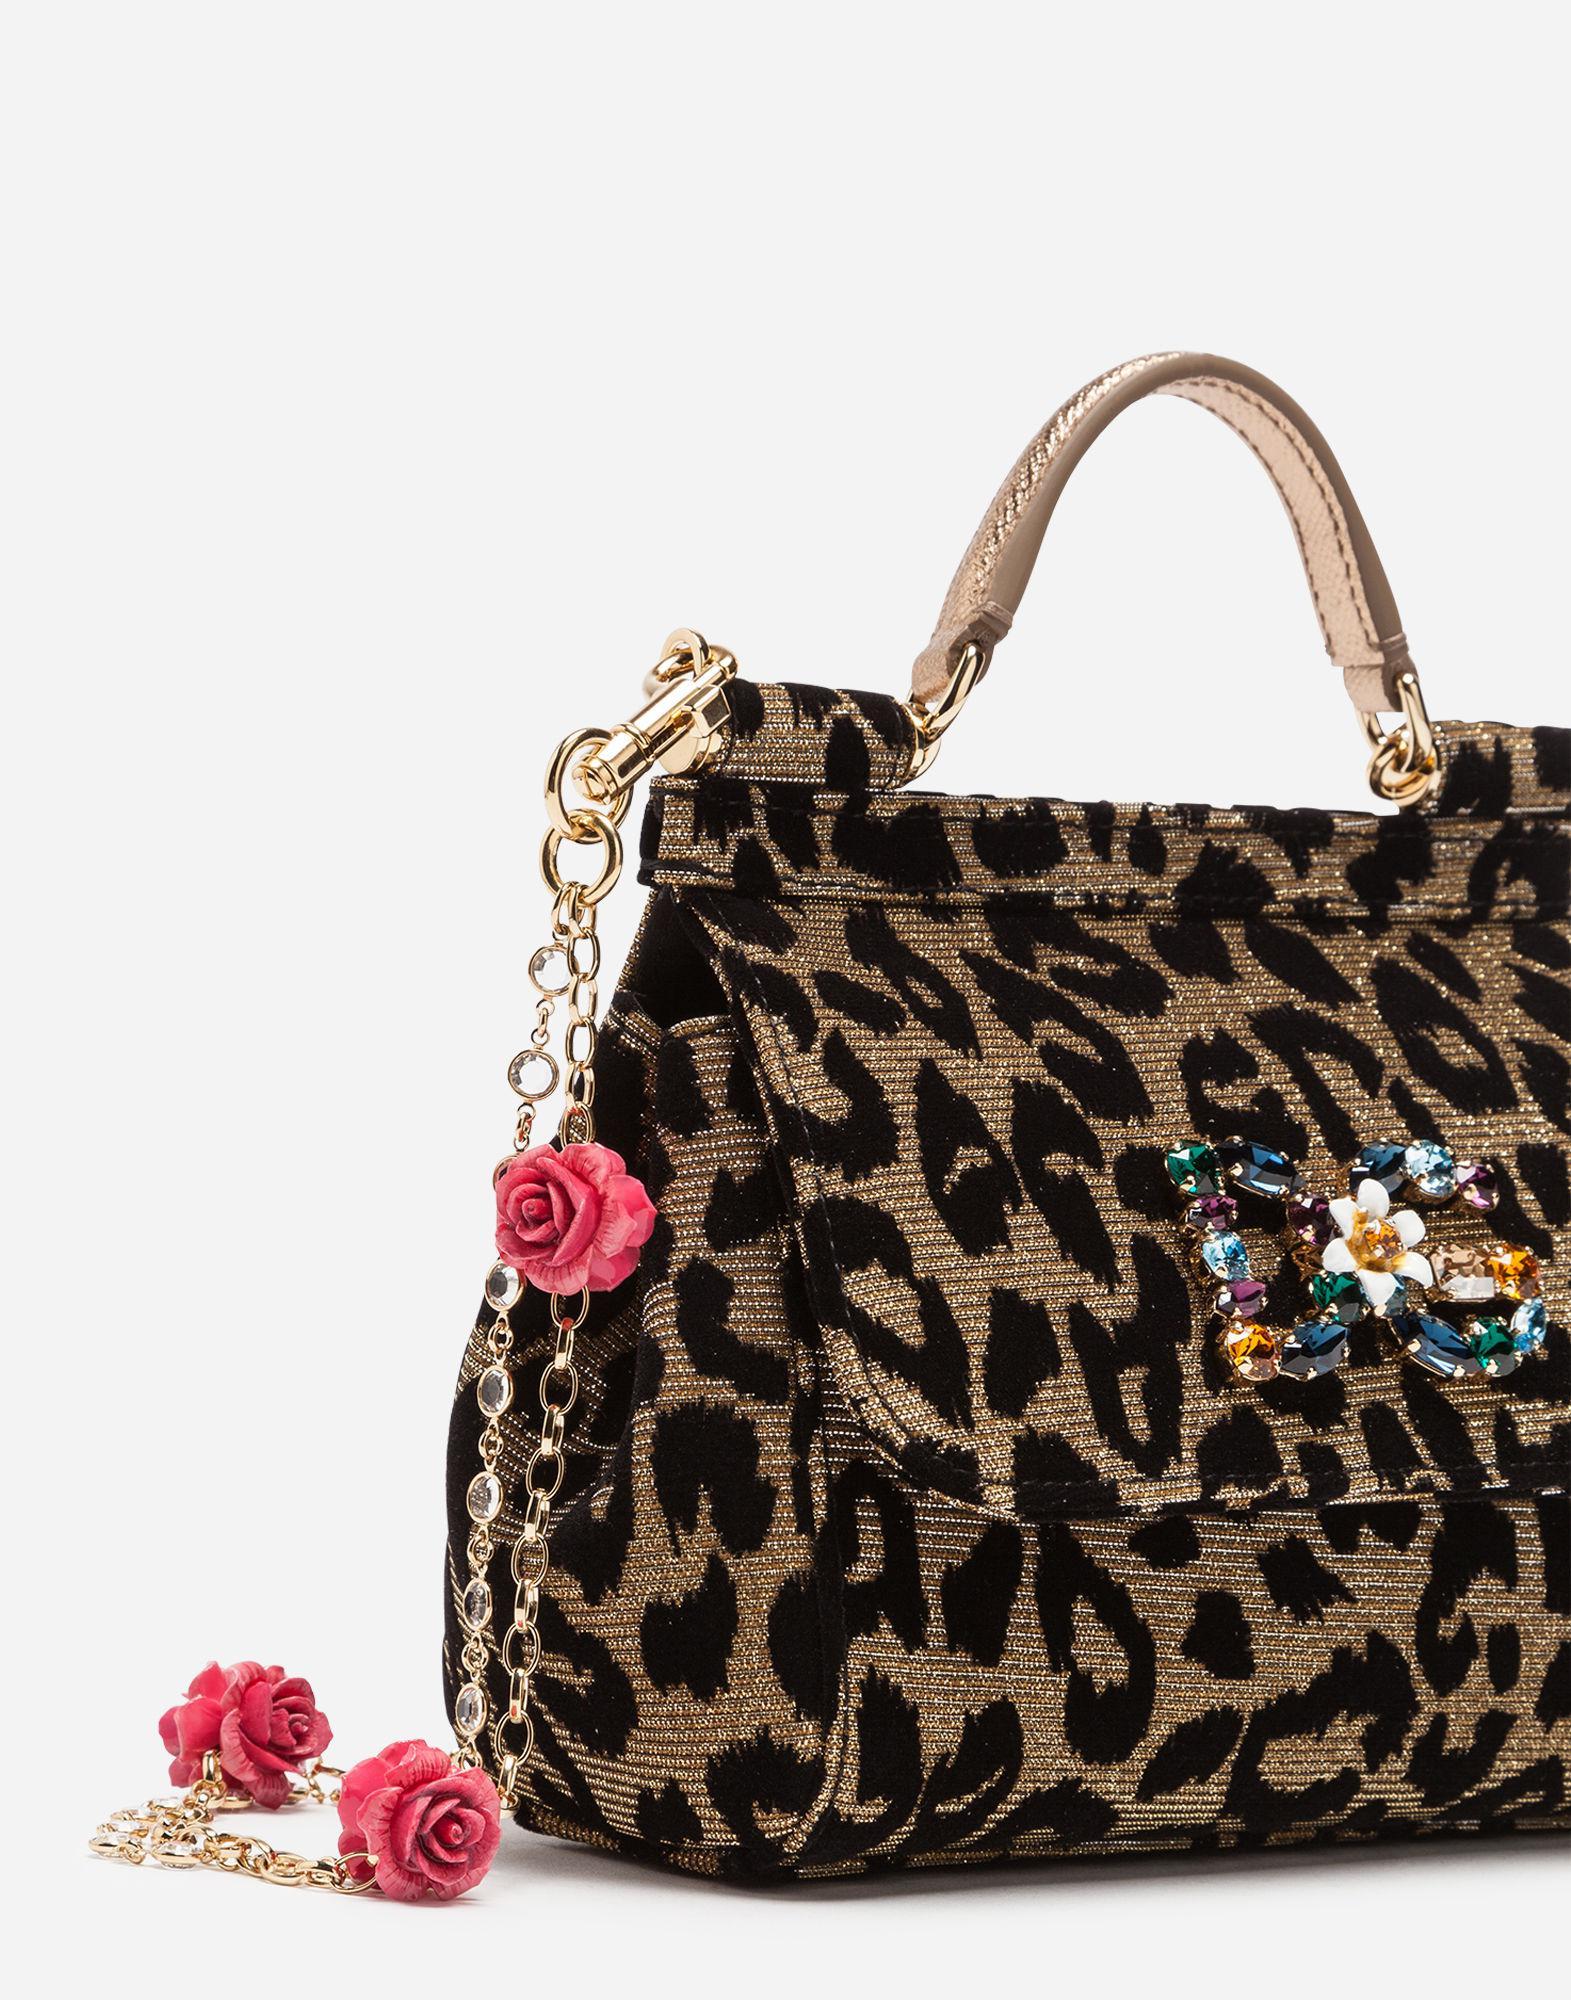 bfcf30a30c7b Lyst - Dolce   Gabbana Mini Sicily Bag In Lurex Jacquard Fabric And  Leopard-print Velvet in Metallic